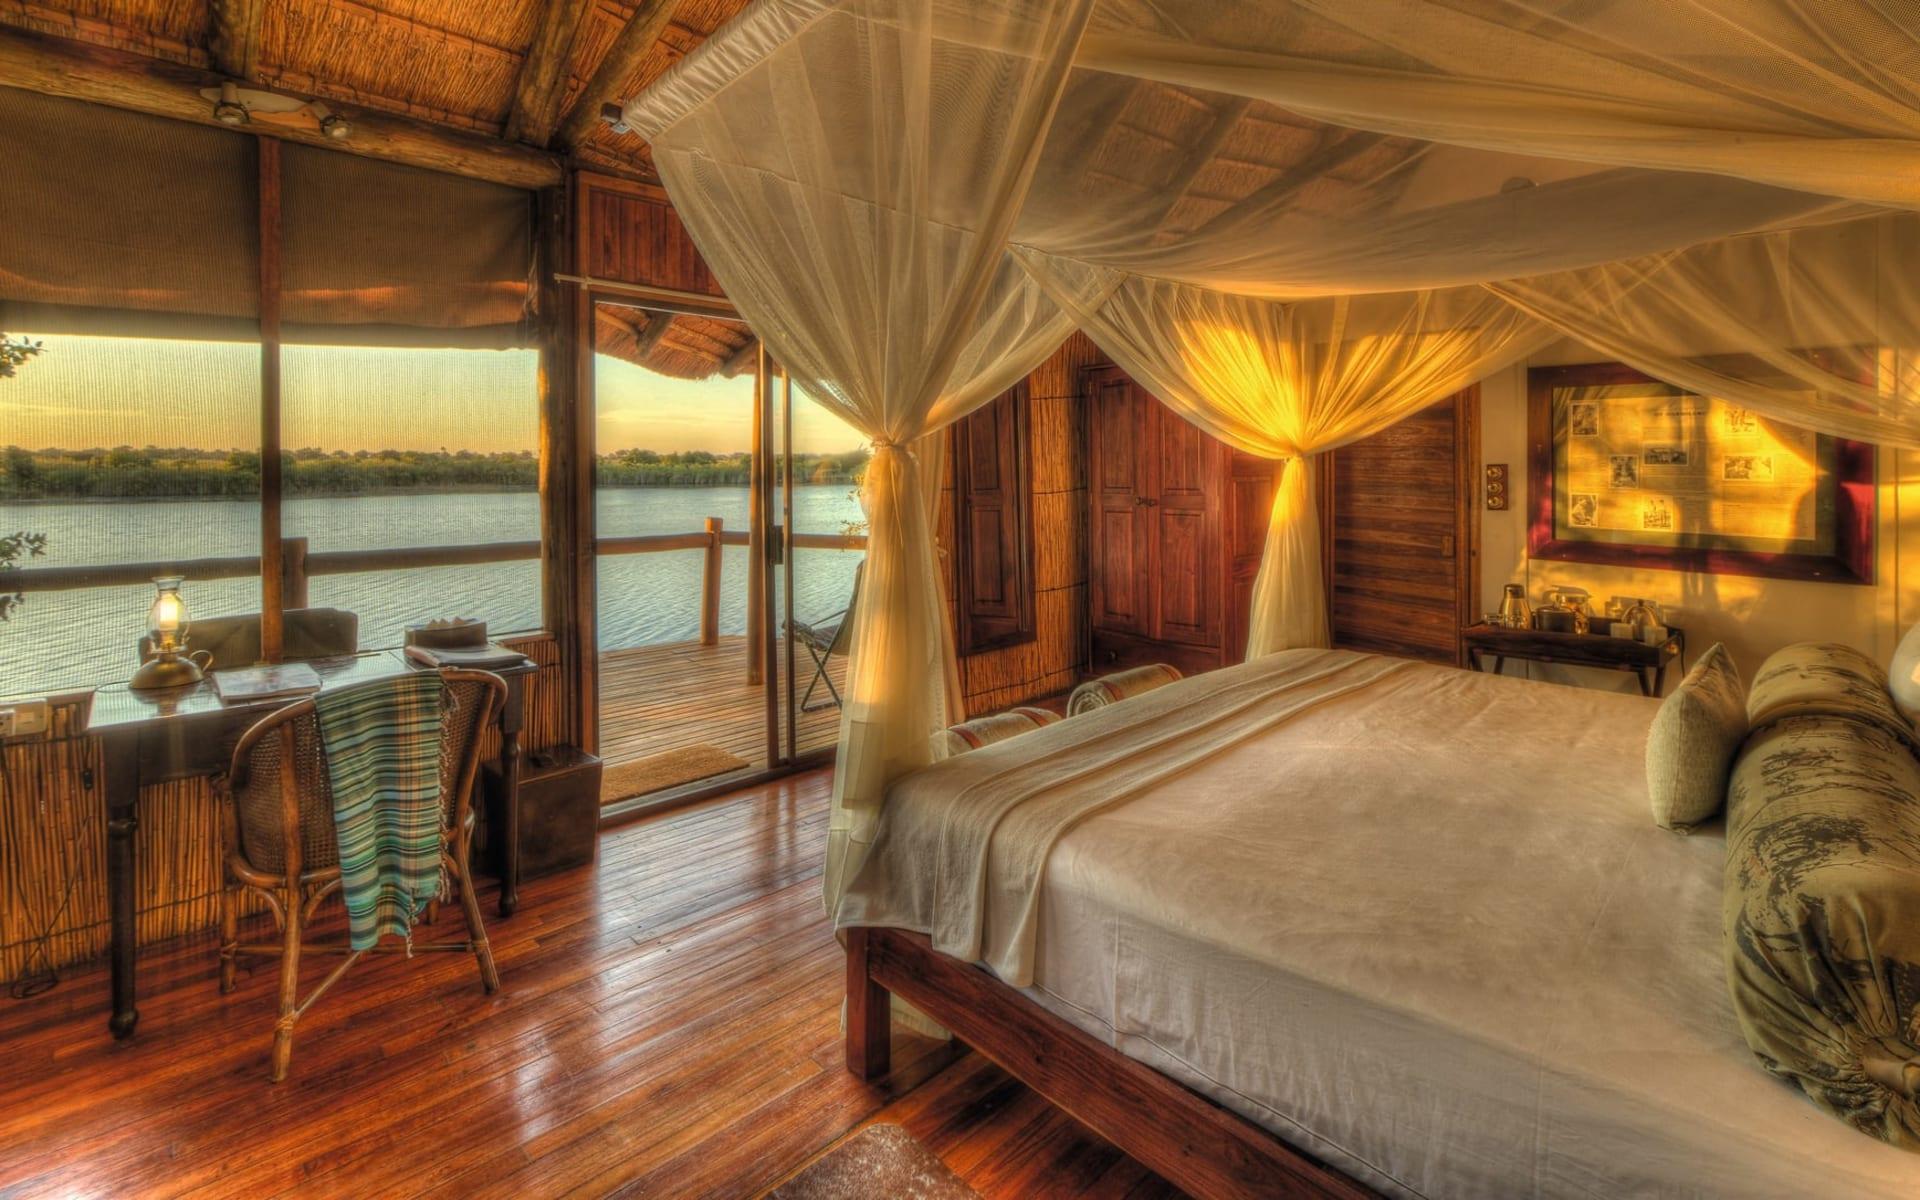 Xugana Island Lodge in Okavango Delta: zimmer Xugana Island Lodge - Bett mit Aussicht c Desert&Delta